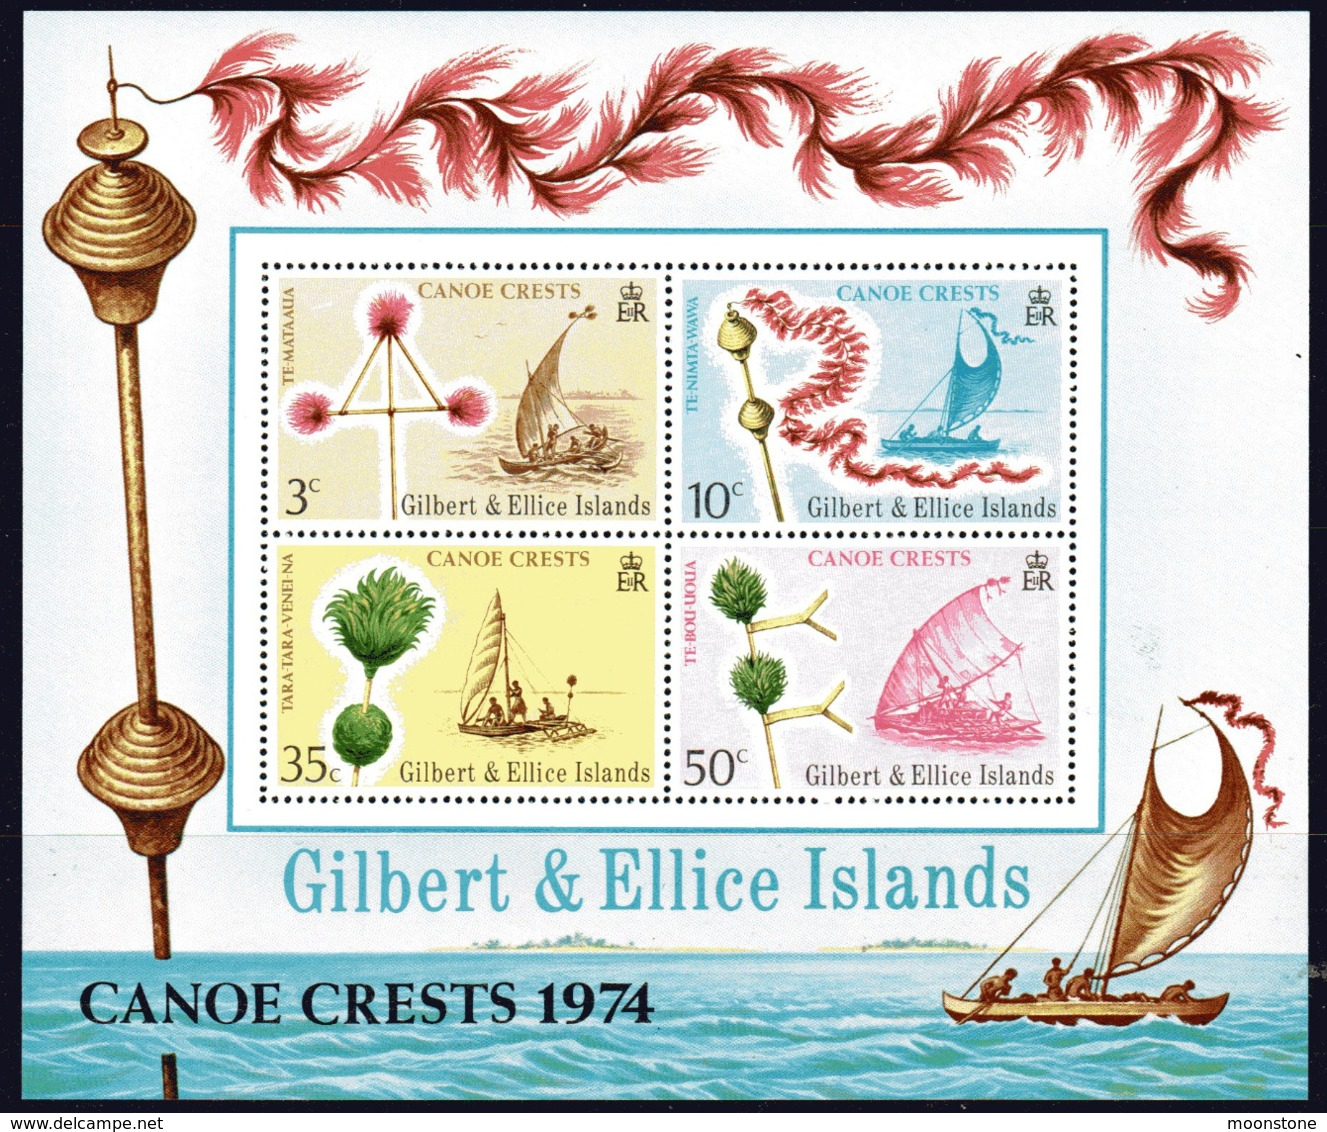 Gilbert & Ellice Islands 1974 Canoe Crests MS, MNH, SG 231 (BP2) - Gilbert & Ellice Islands (...-1979)